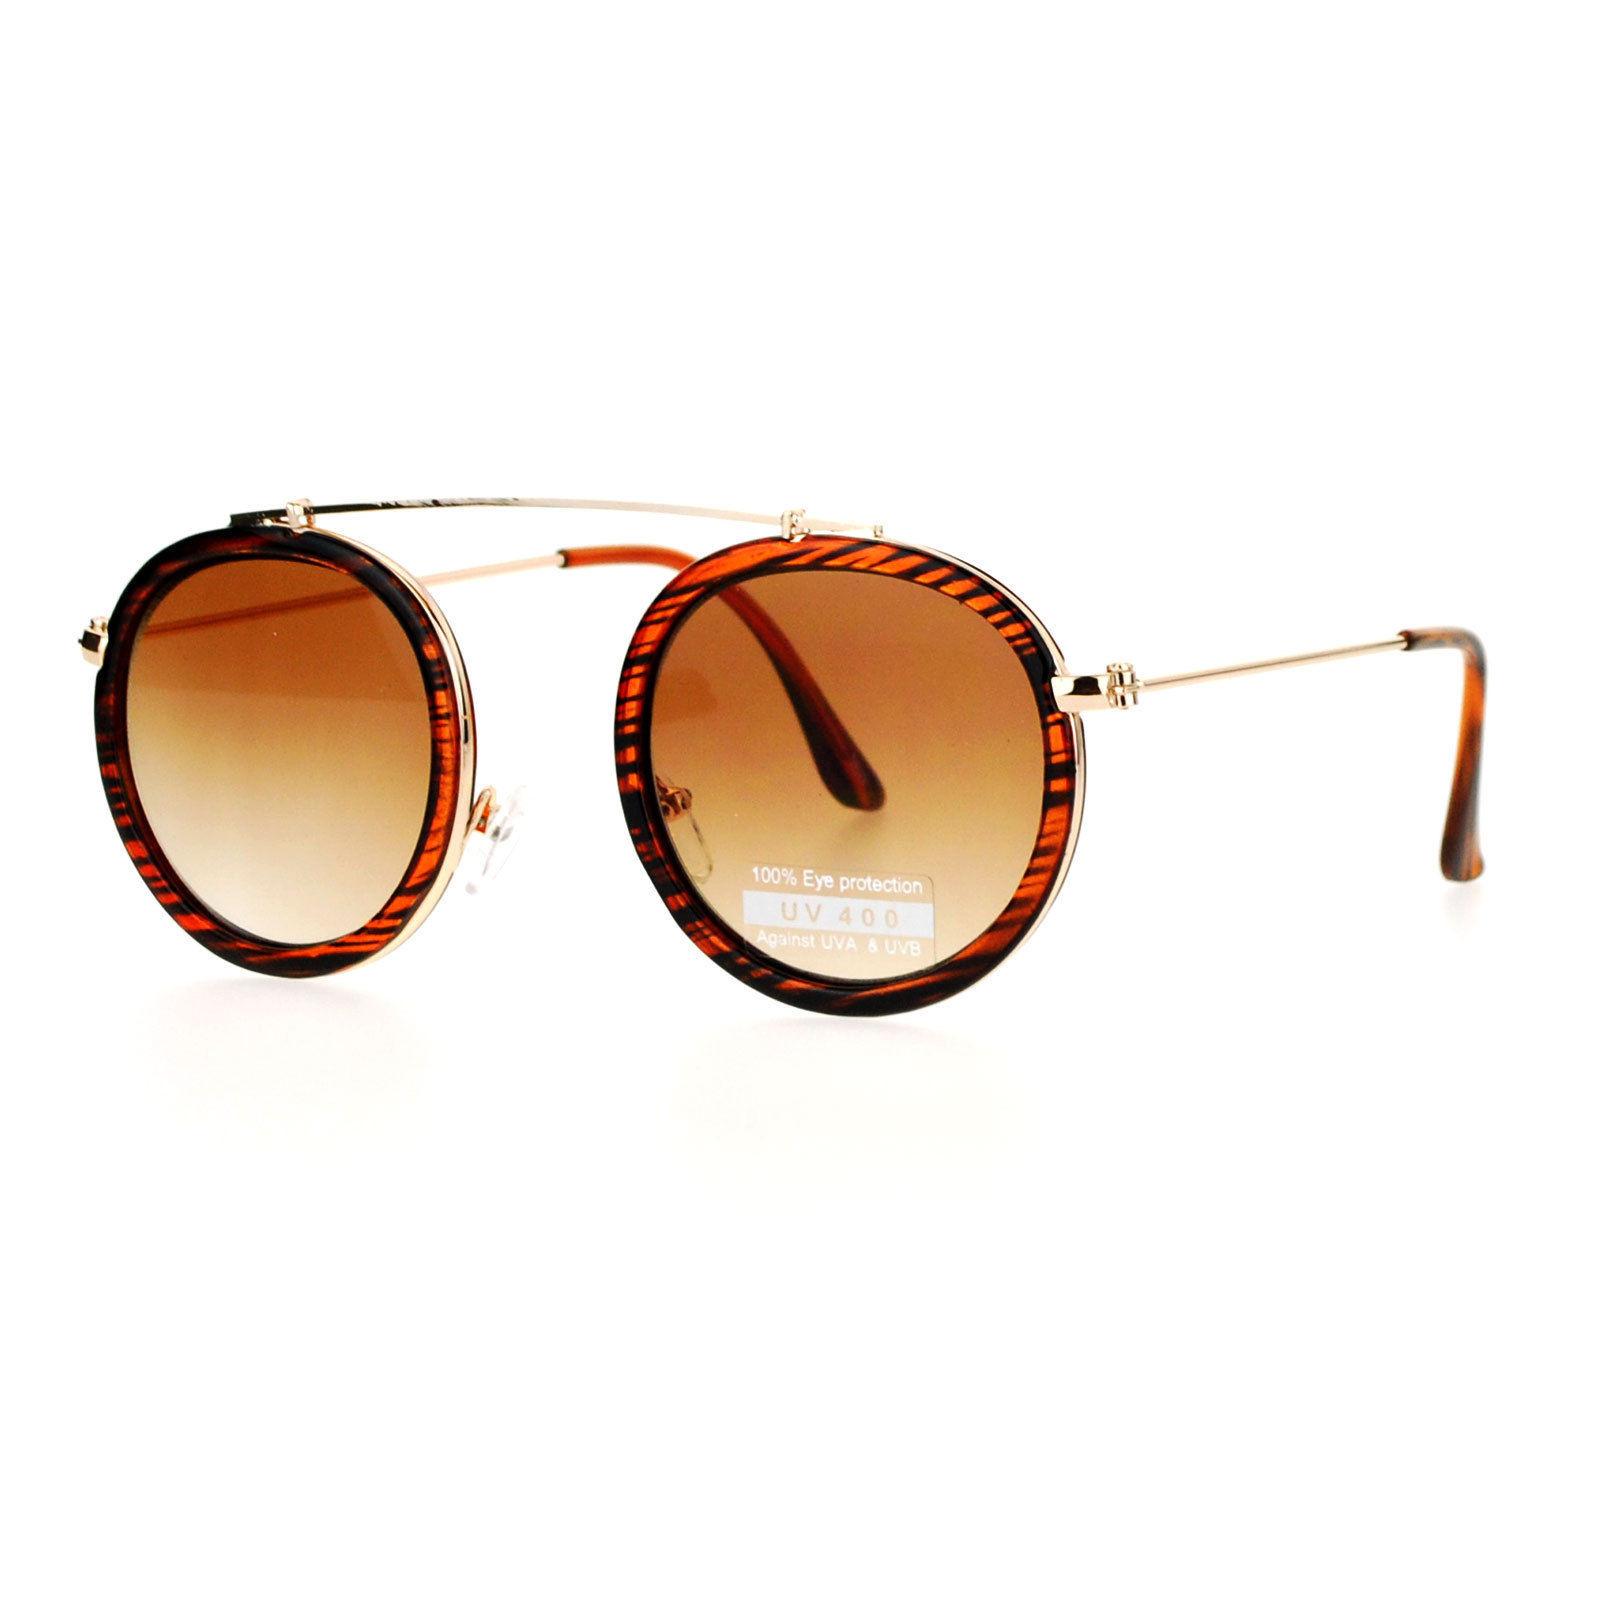 Vintage Retro Fashion Sunglasses Round Metal Top Bridge Flat Narrow Frame Lens